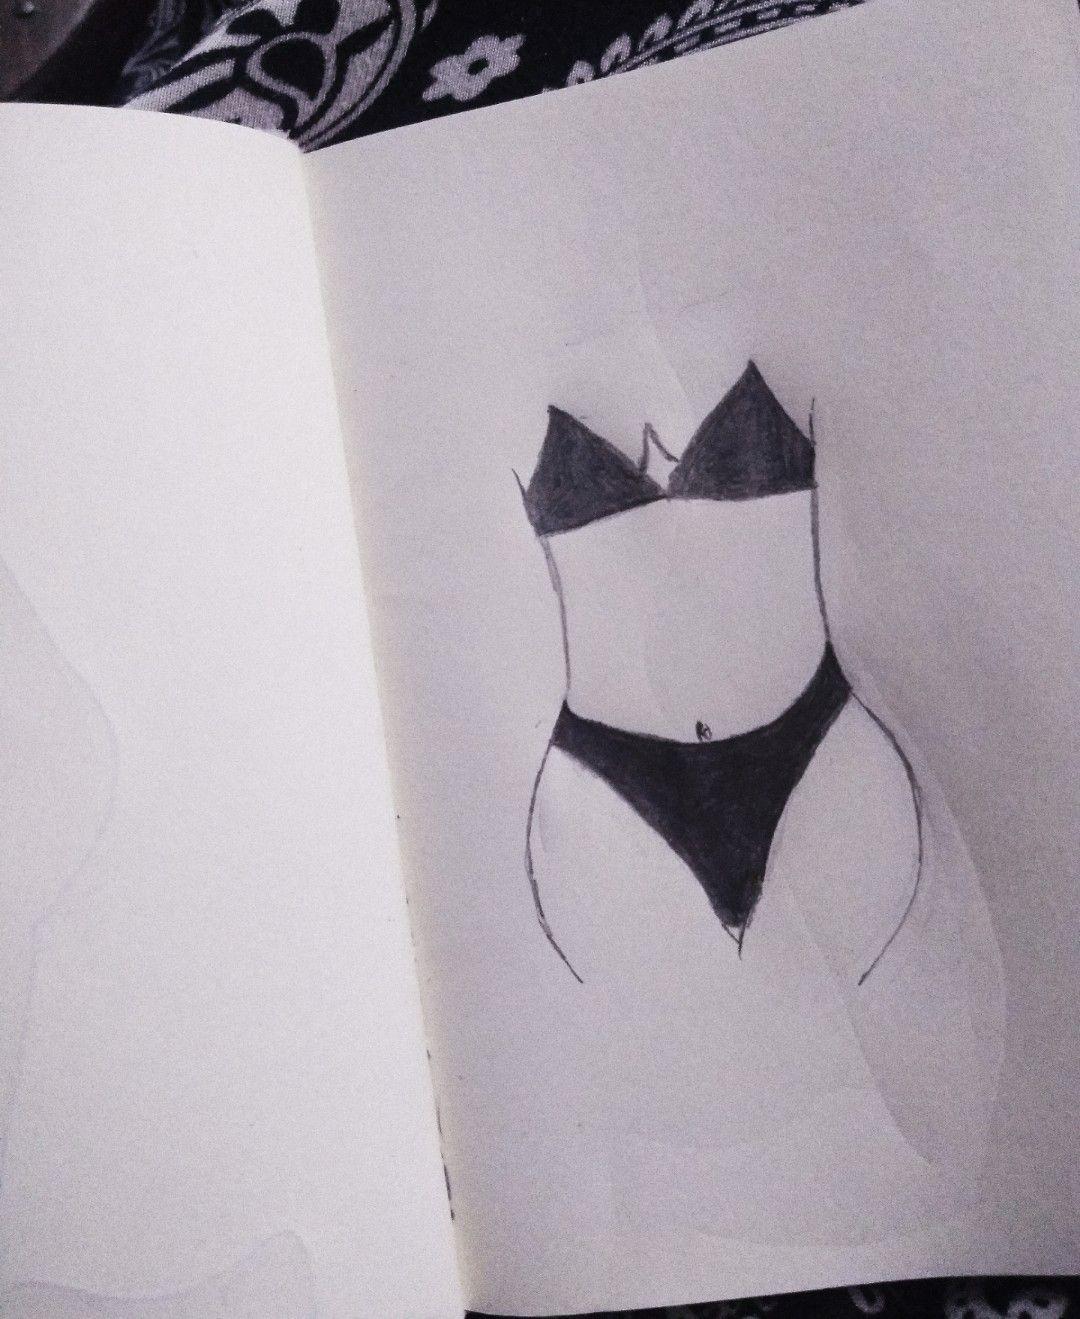 32bcbd473 Desenho. Roupa íntima. Corpo. Mulher. Curvas. ❤ .